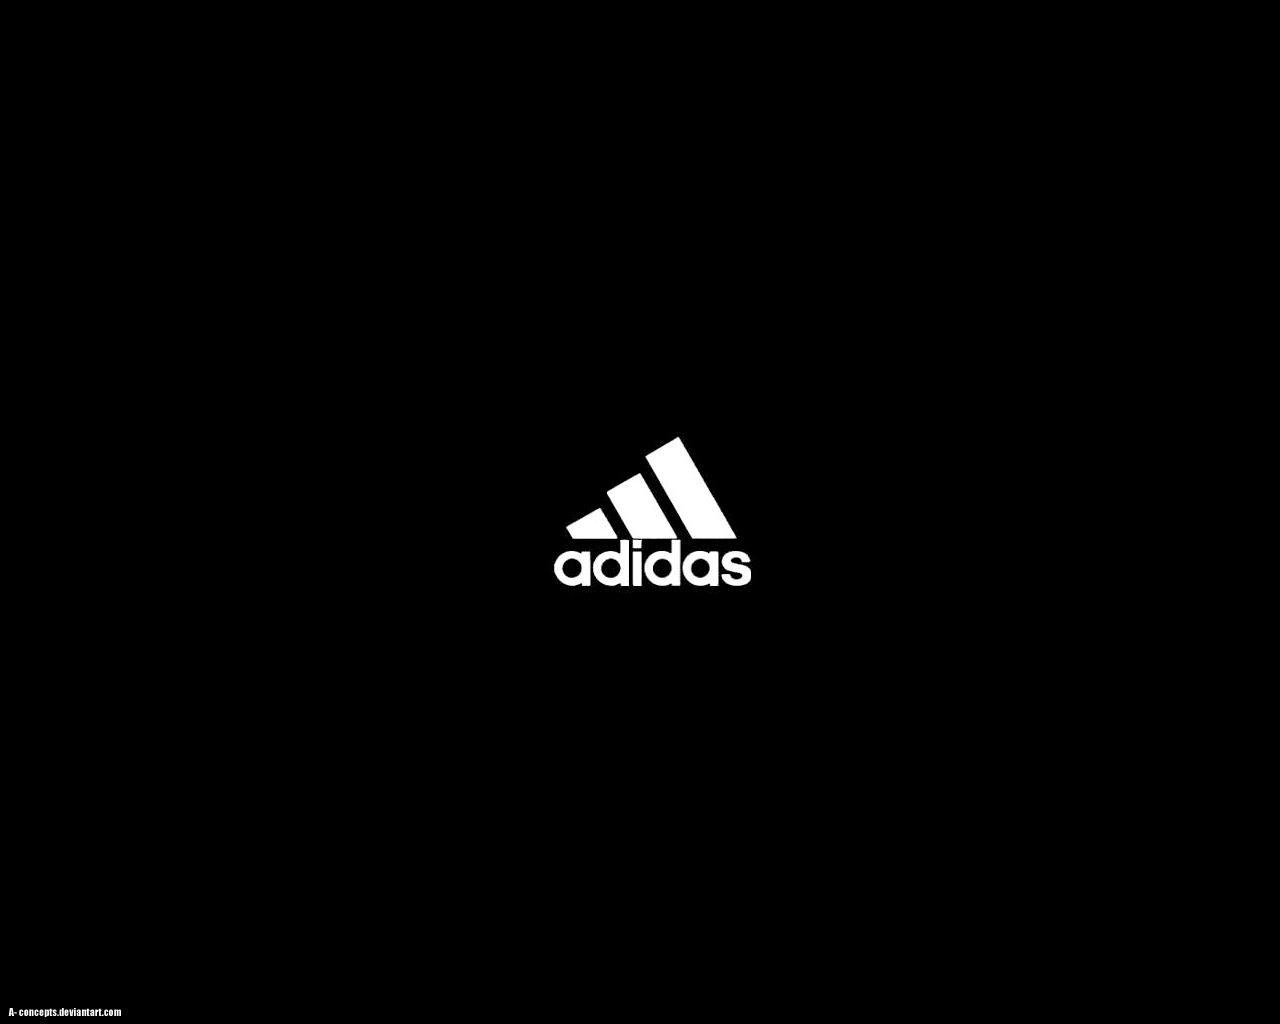 Adidas Logo Black n' White by a-concepts on DeviantArt